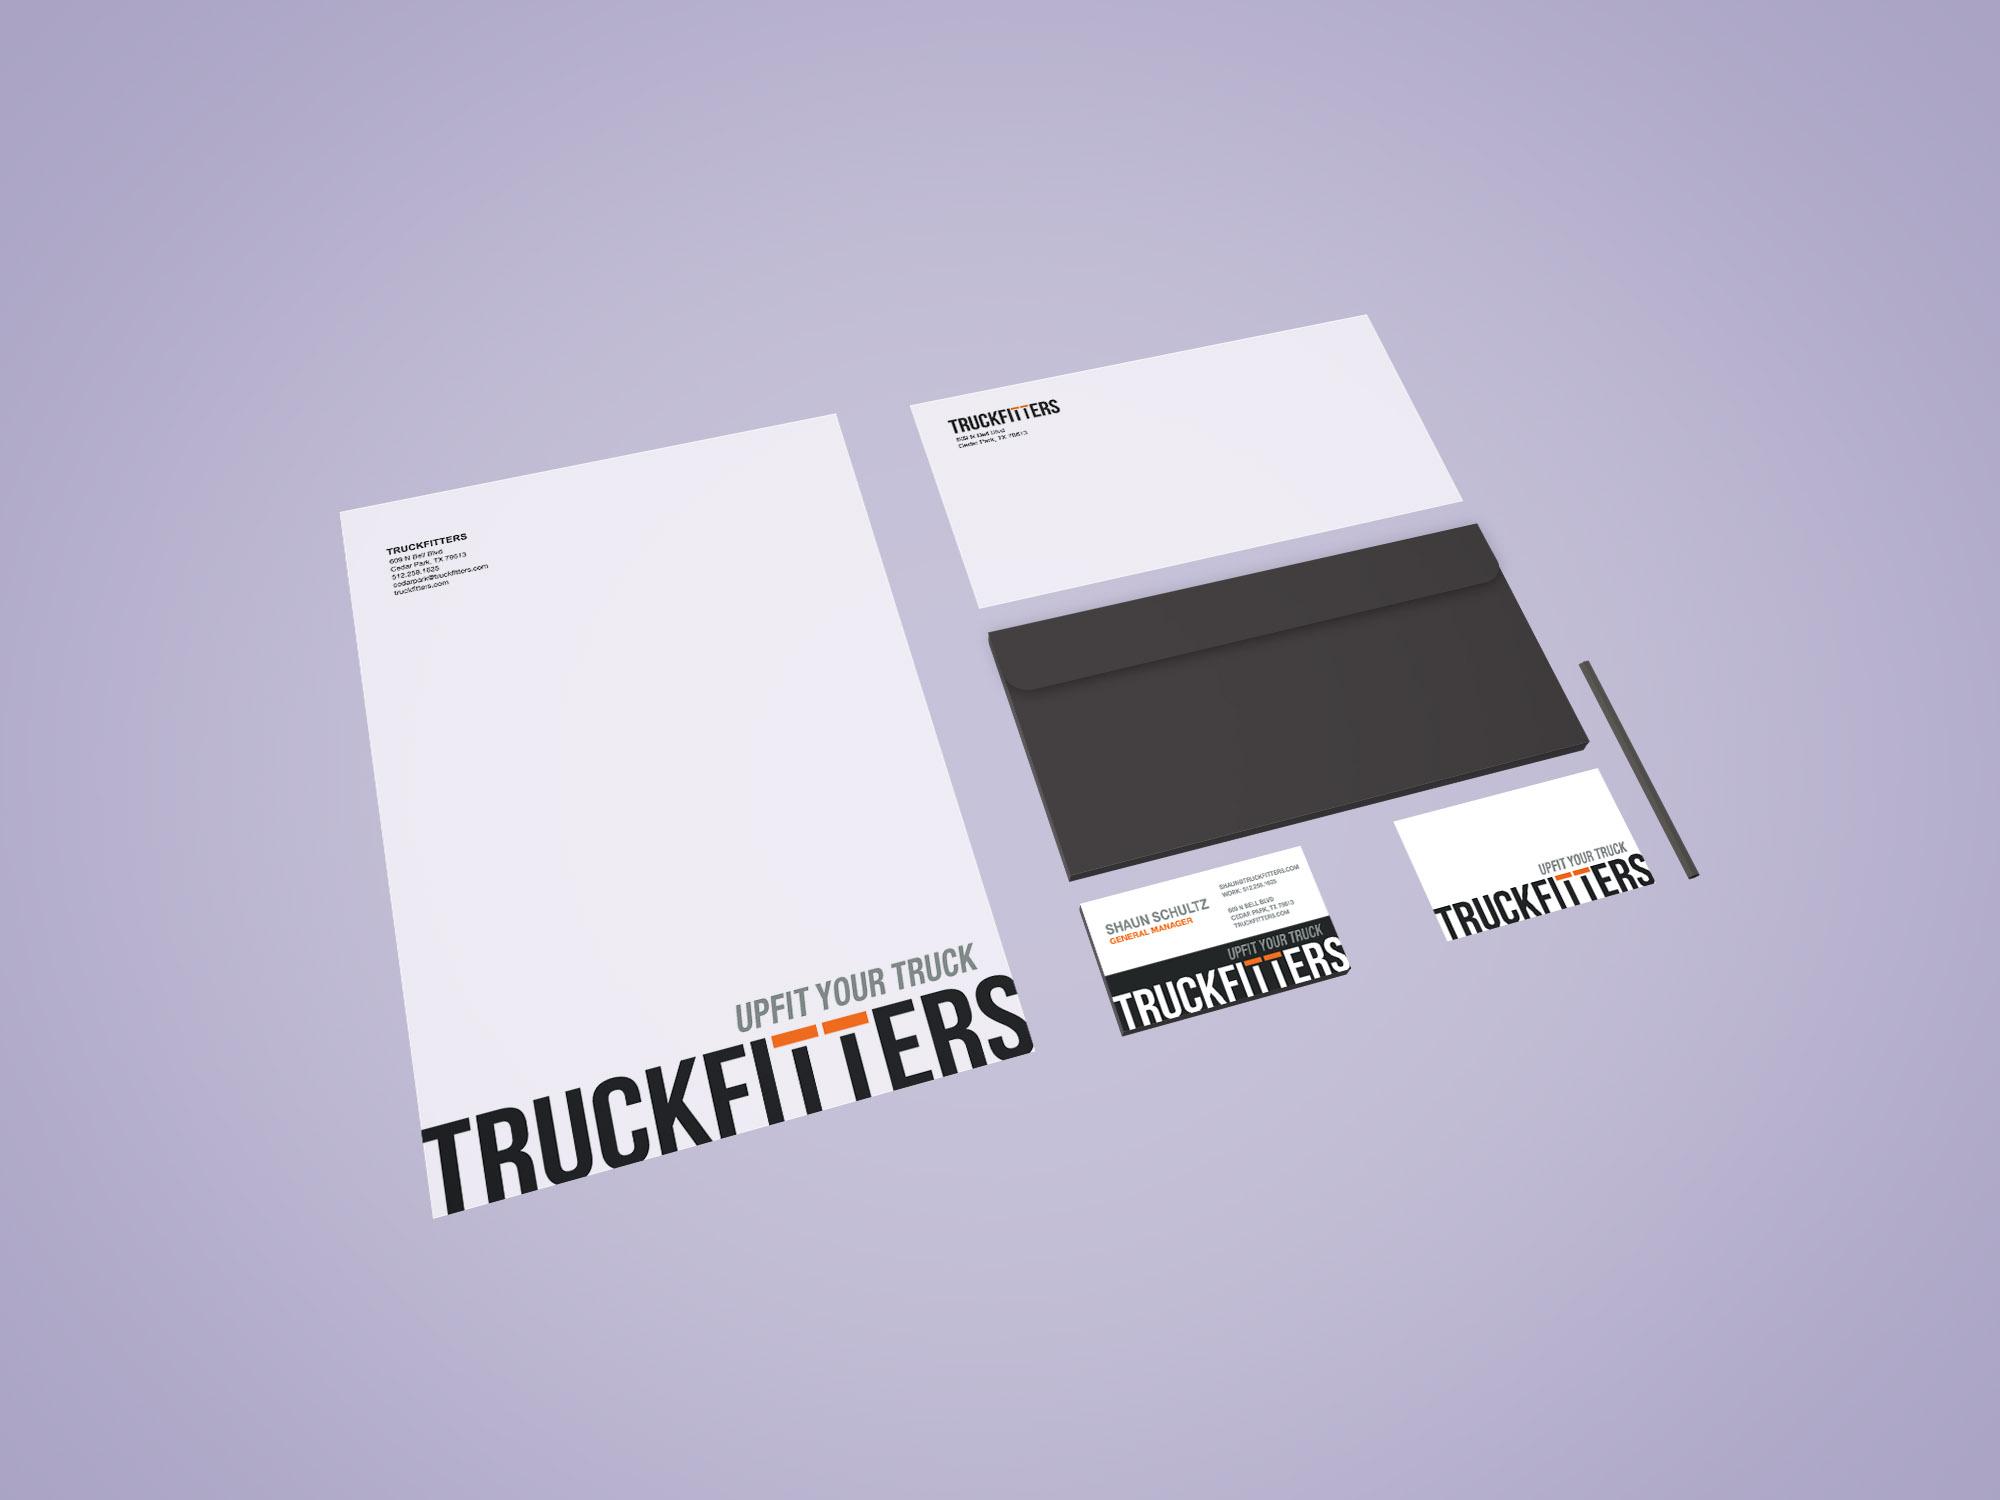 truckfitters rebrand   espresso marketing